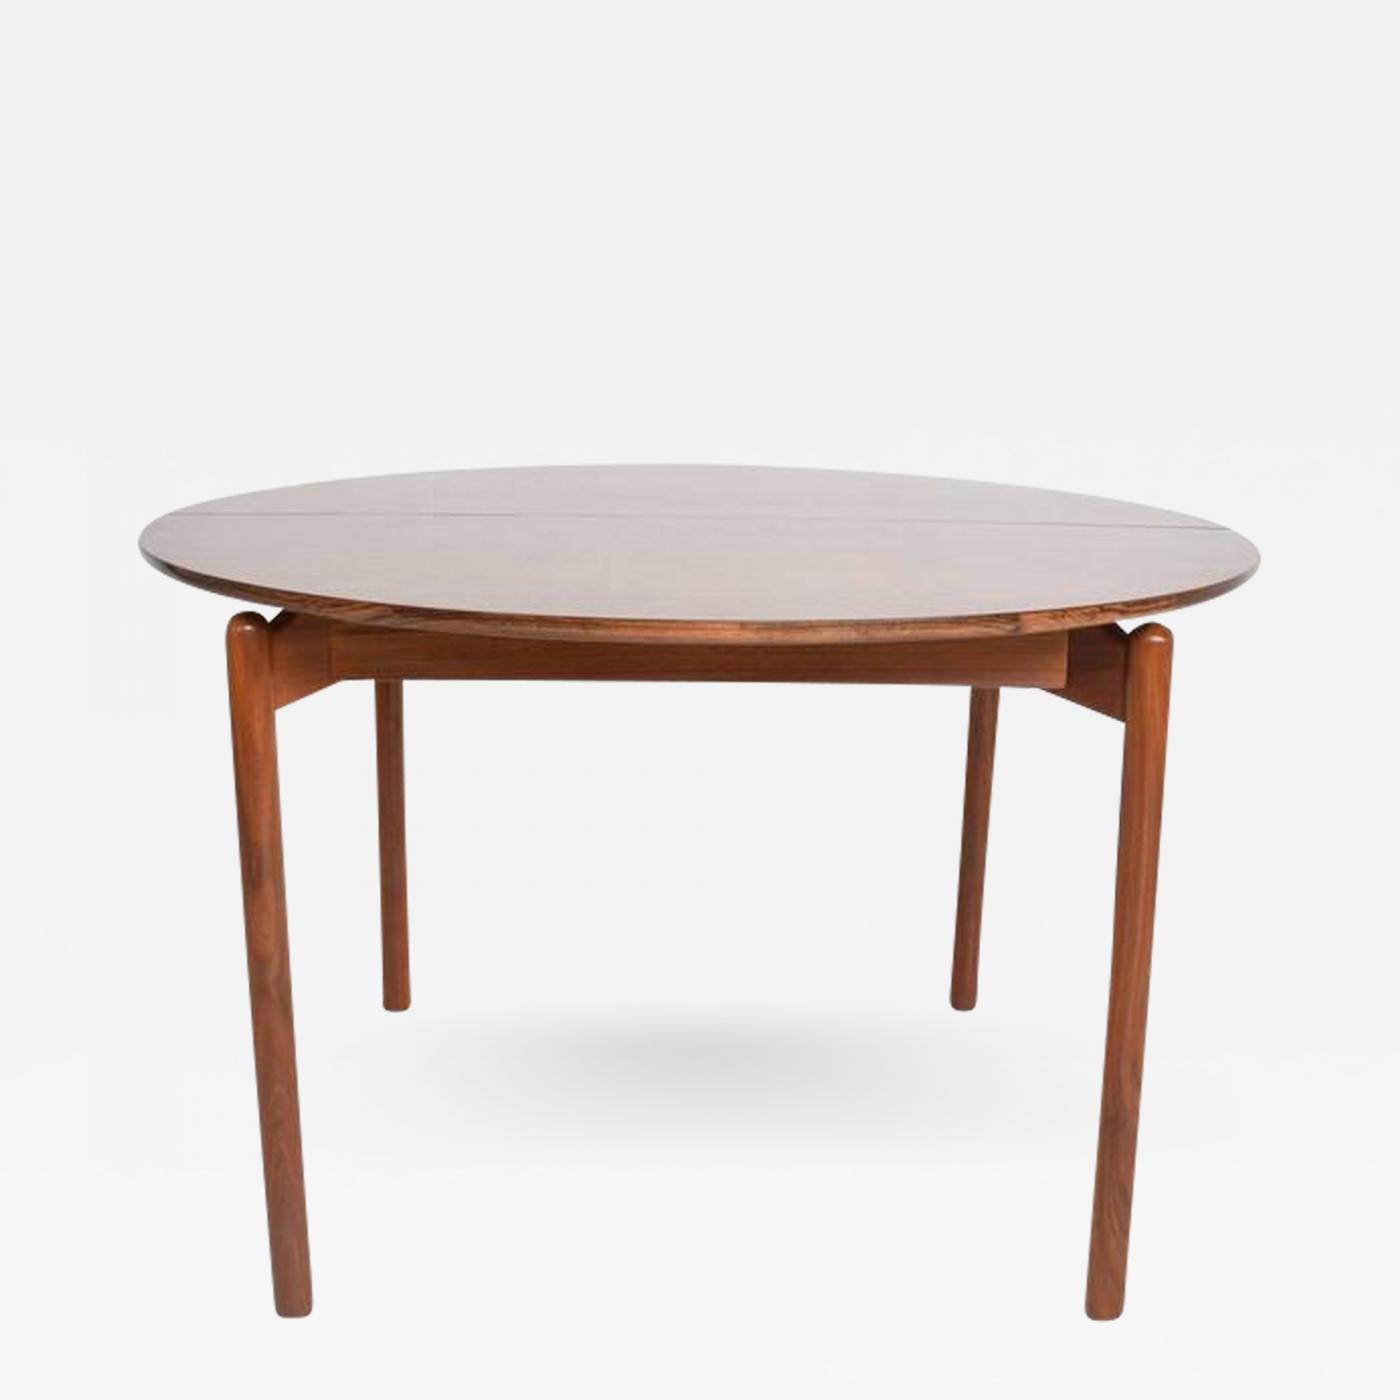 Greta grossman mid century modern walnut dining table by greta listings furniture tables dining tables greta grossman geotapseo Gallery